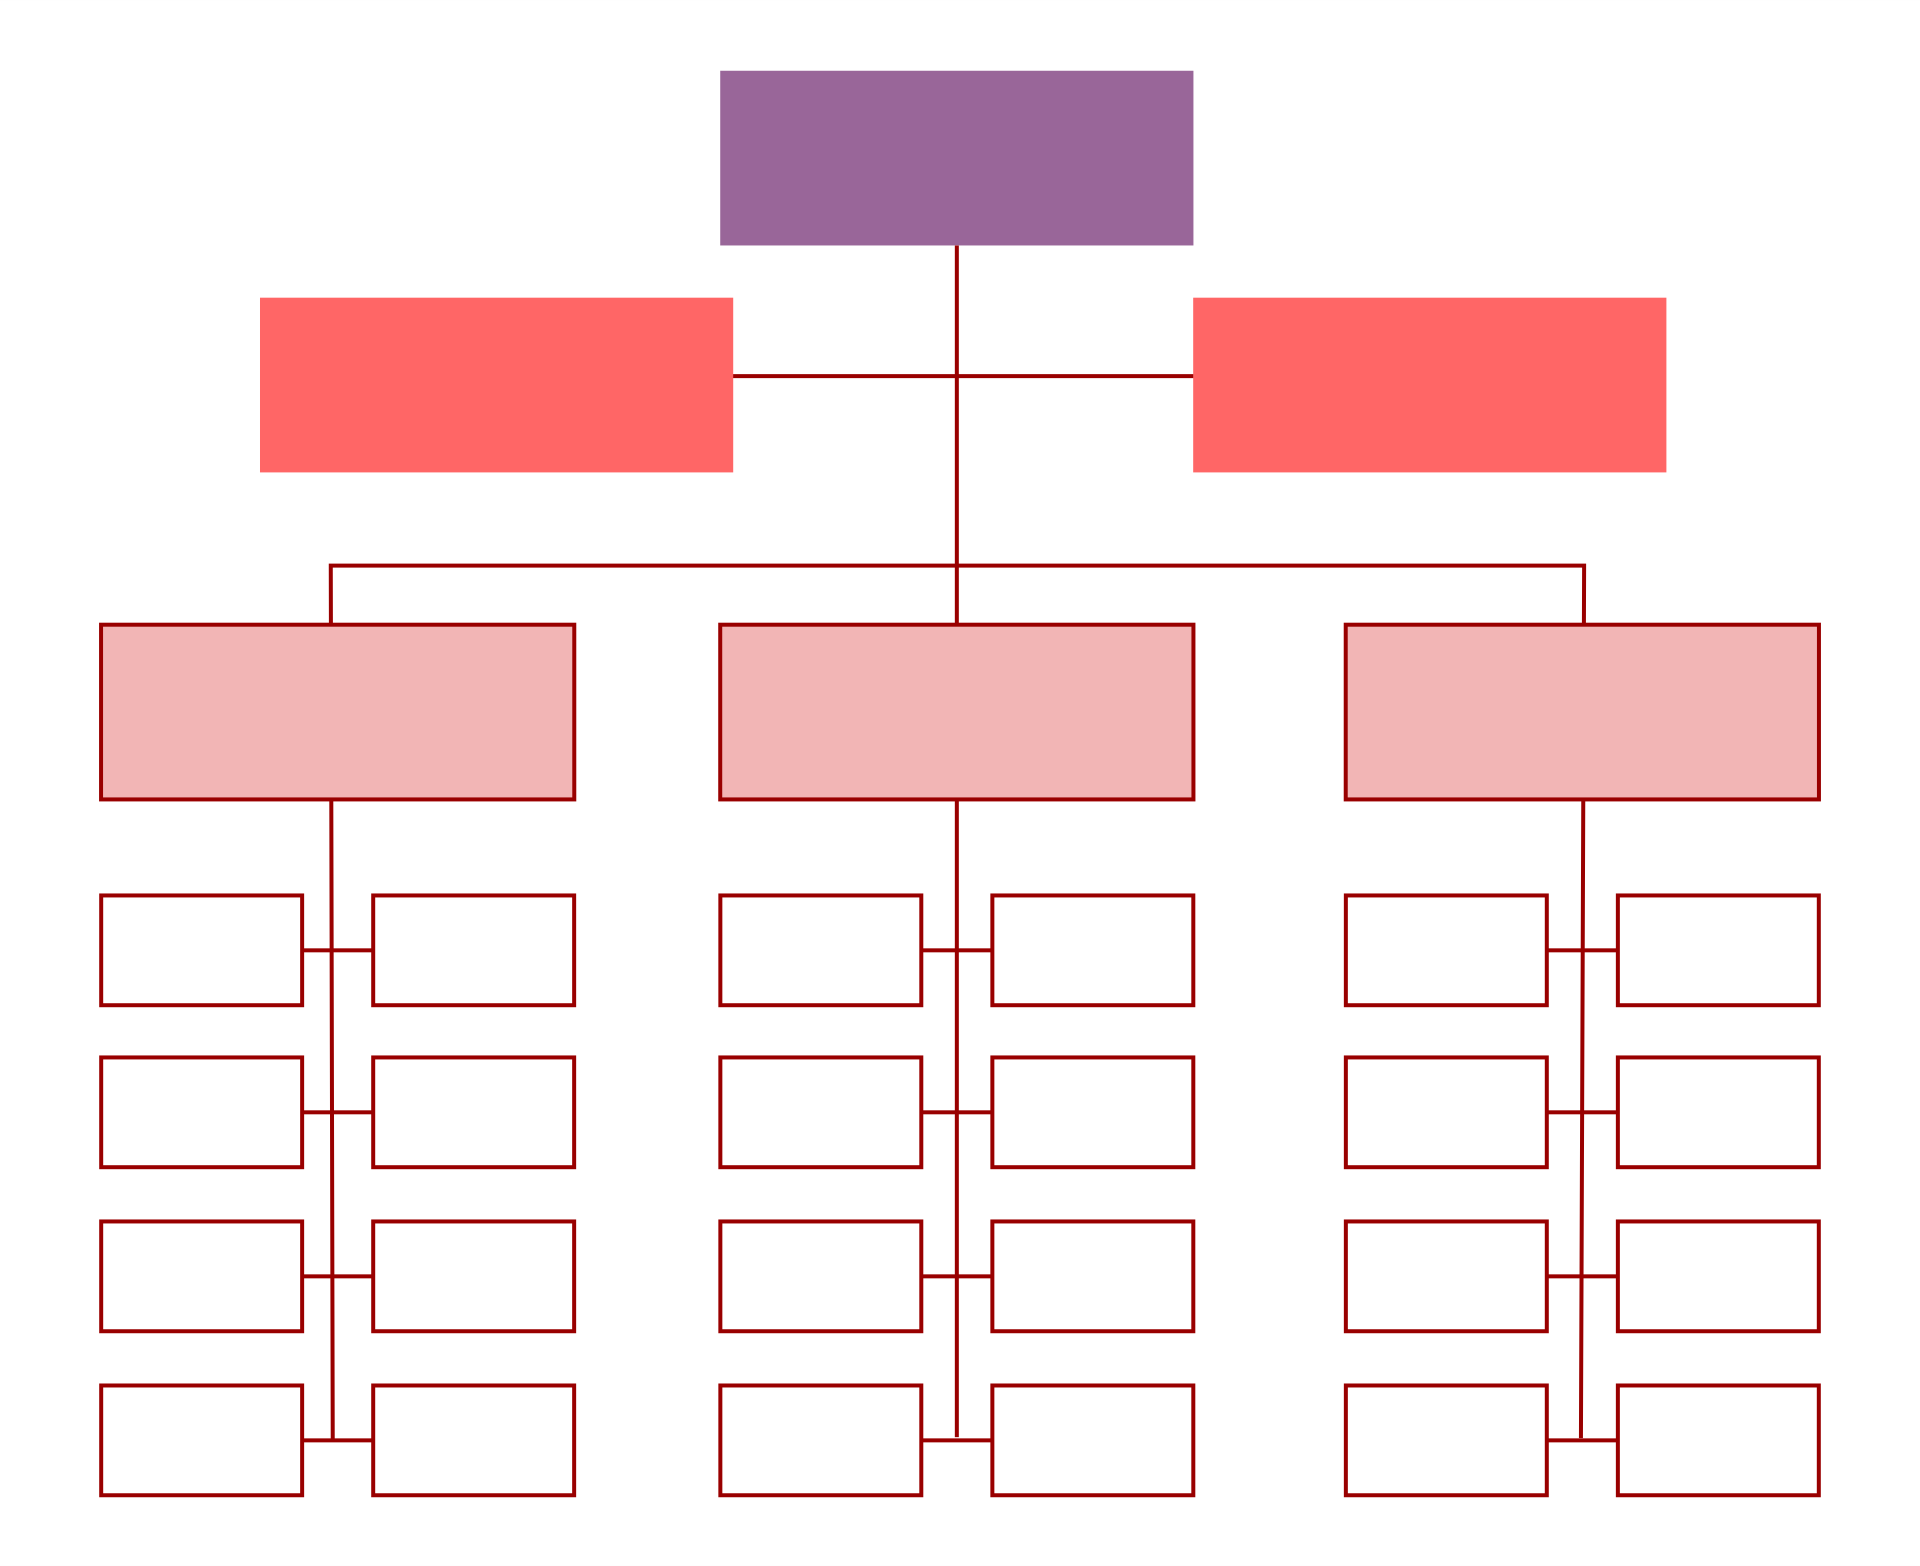 Free Blank Organizational Chart Template